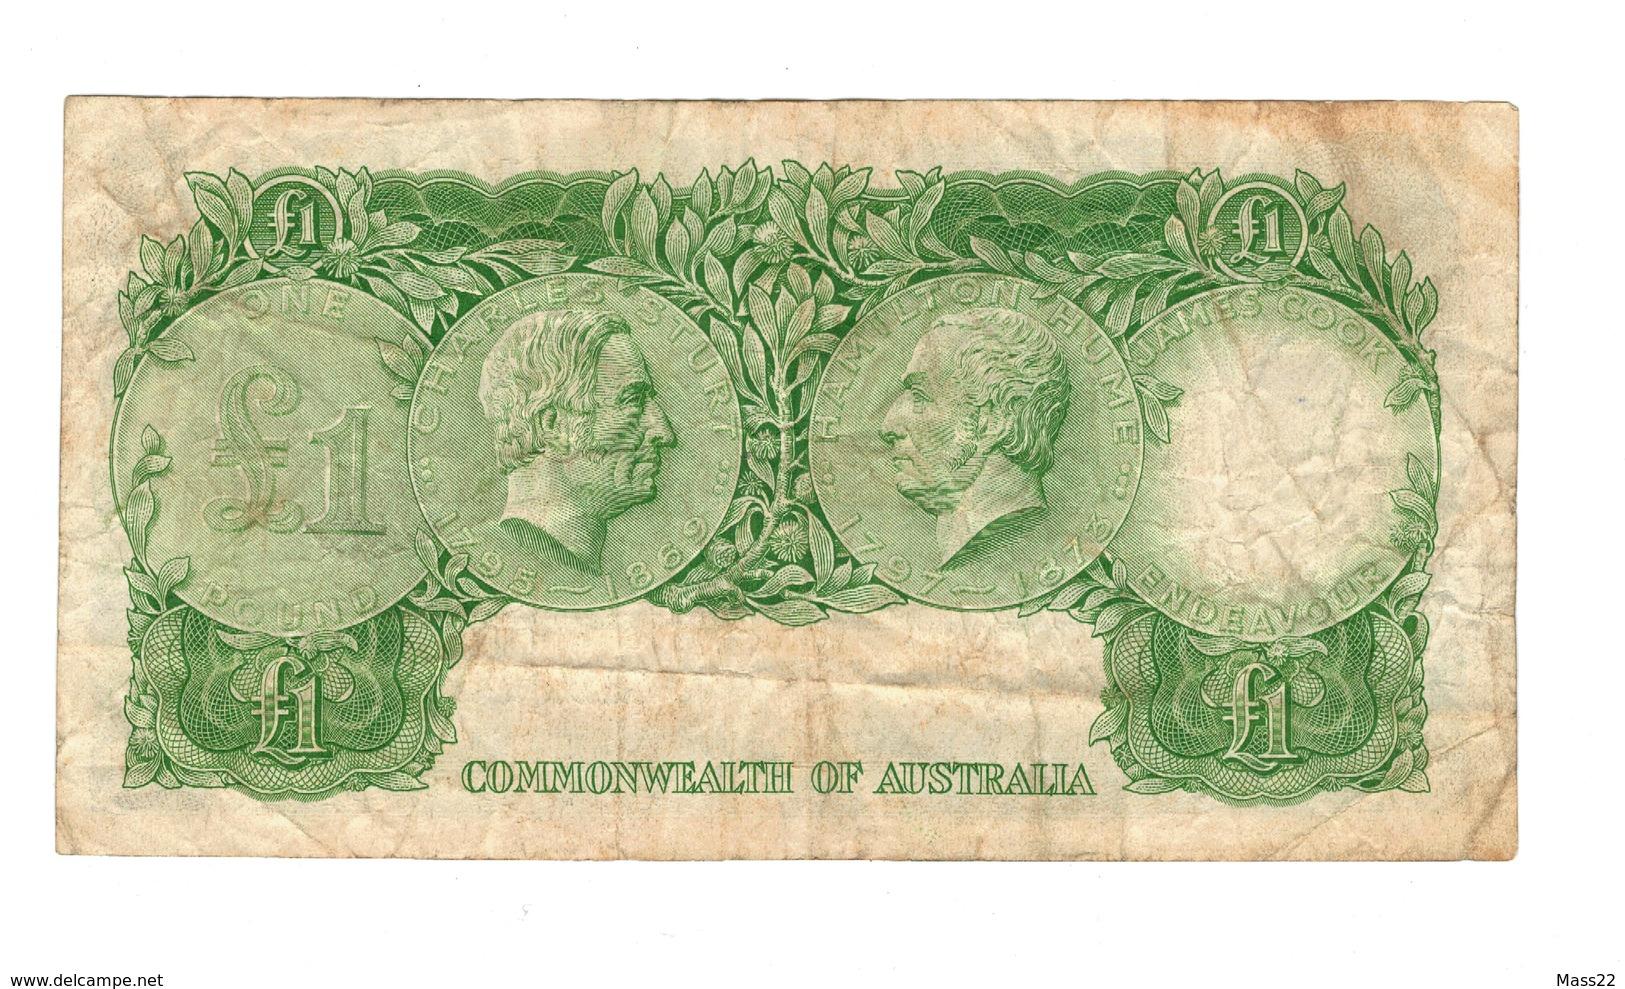 Coombs Wilson Australian One Pound, 1953 VF, HE 26 - 1953-60